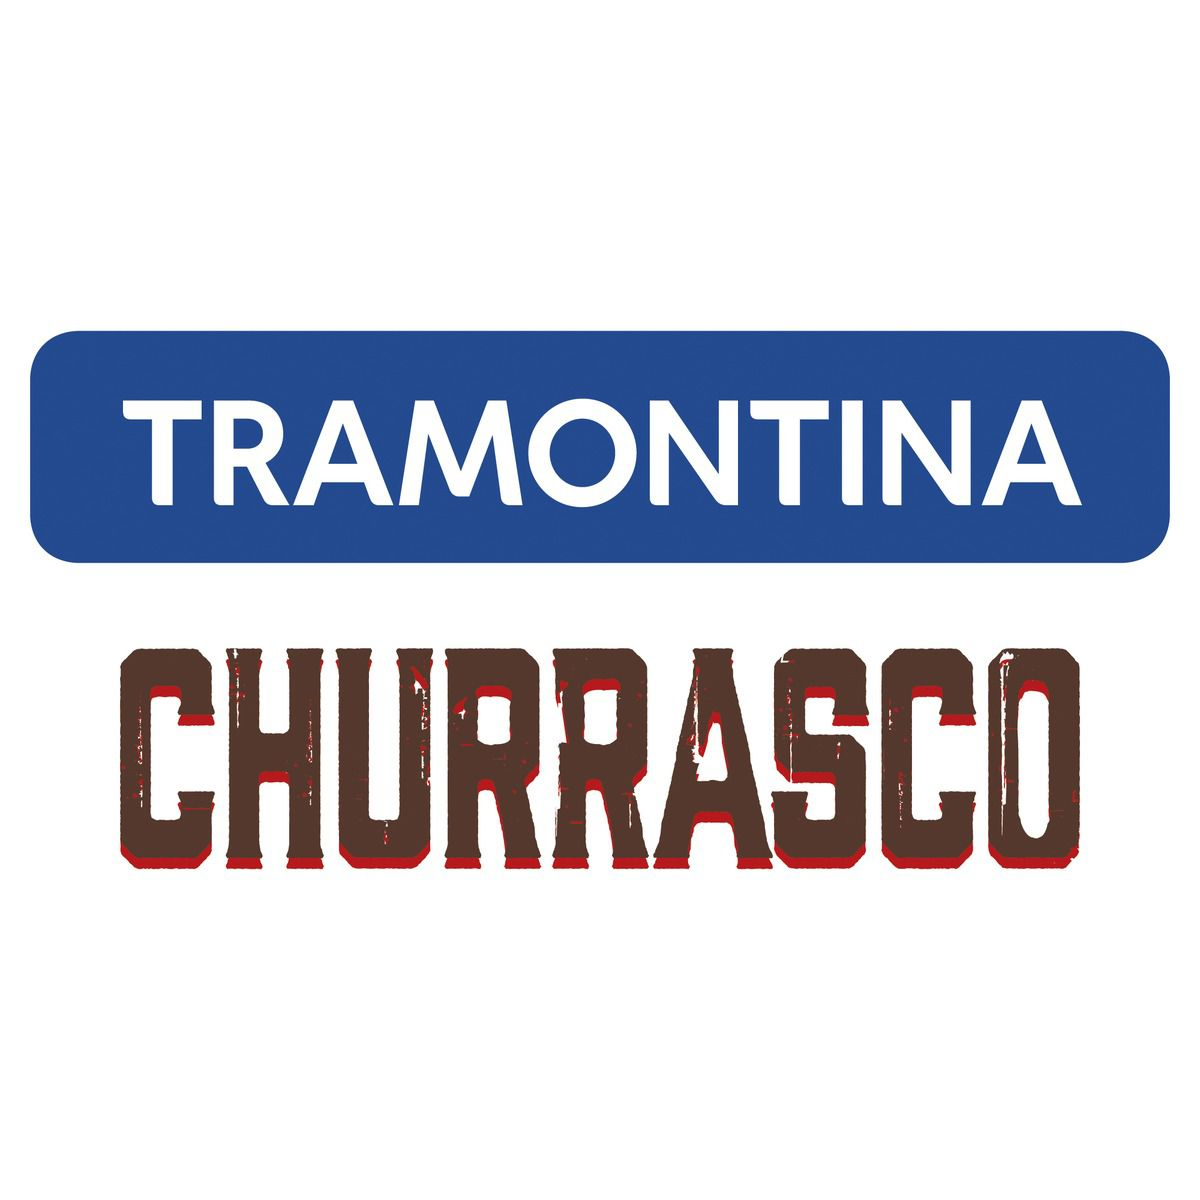 "Faca para churrasco jumbo 5"" 21116/075 | Lojas Estrela"